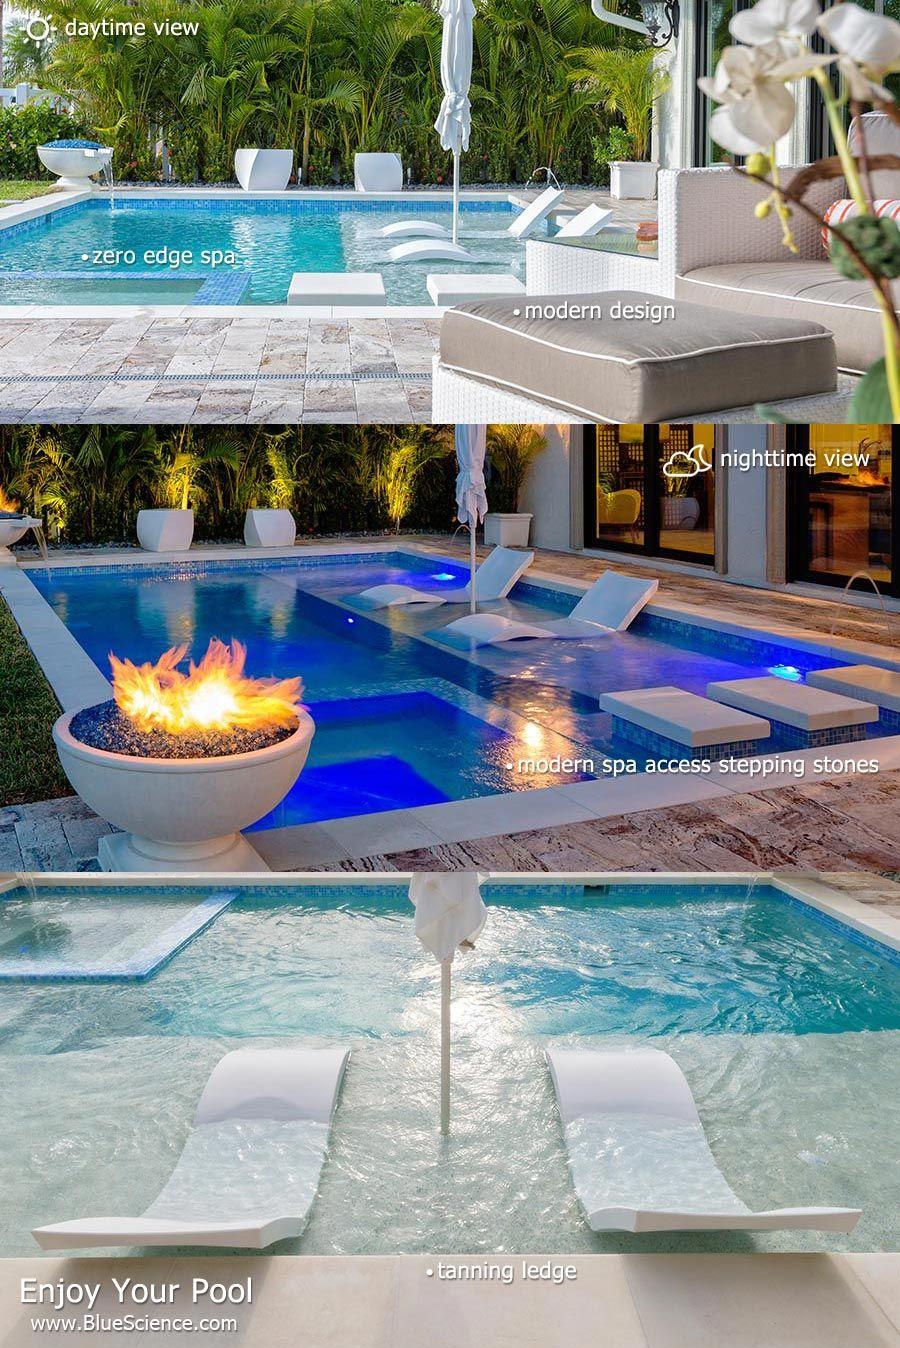 Blue Science: Award Winning Houston Pool Builder